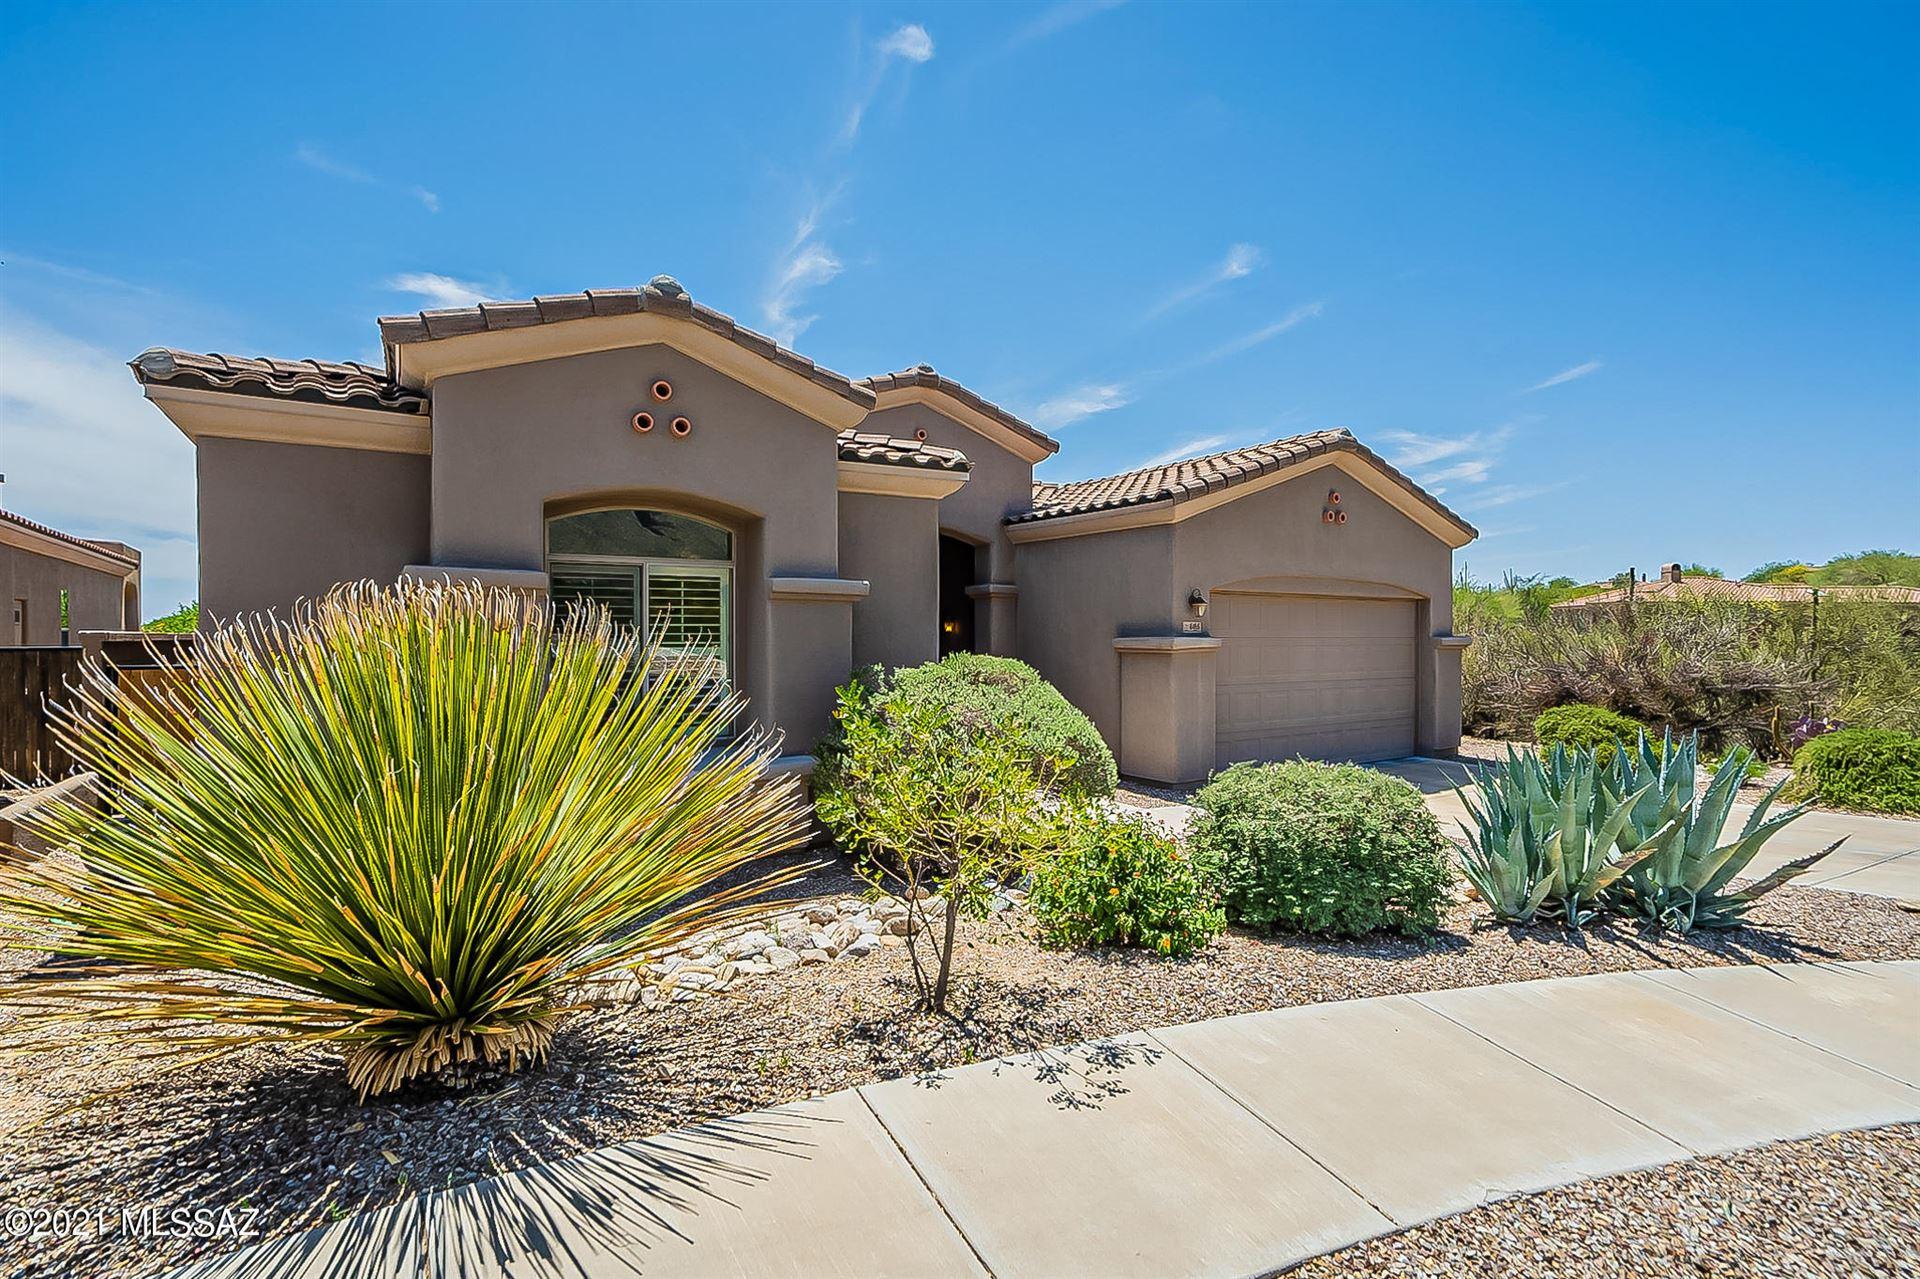 6165 N Campo Abierto, Tucson, AZ 85718 - MLS#: 22112533